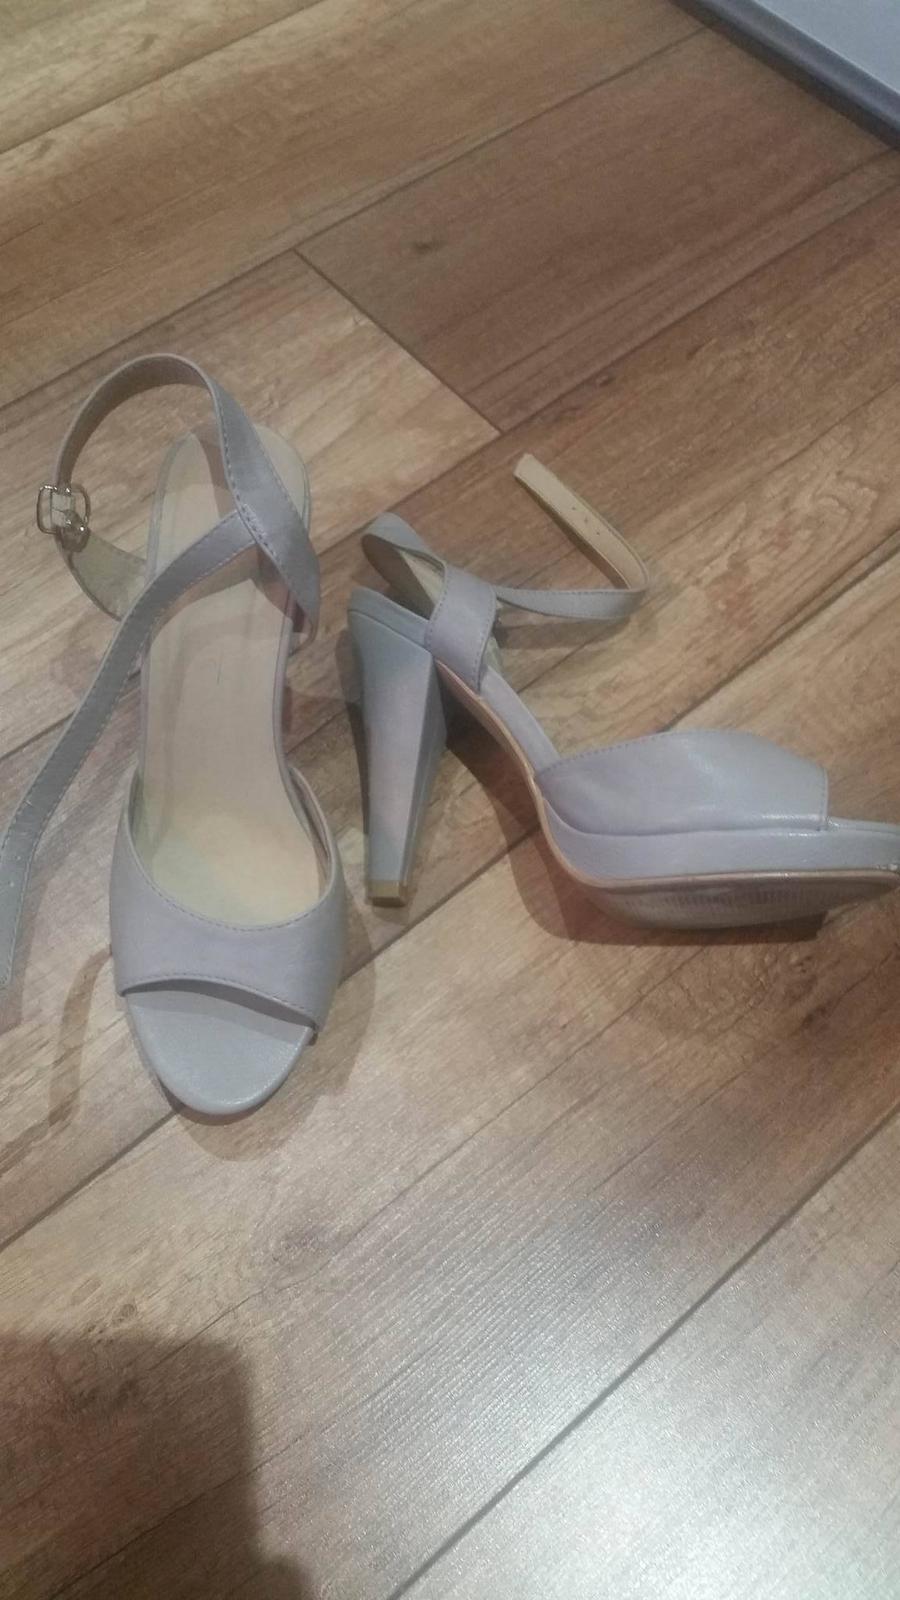 Sivé sandáliky - 38 - Obrázok č. 1